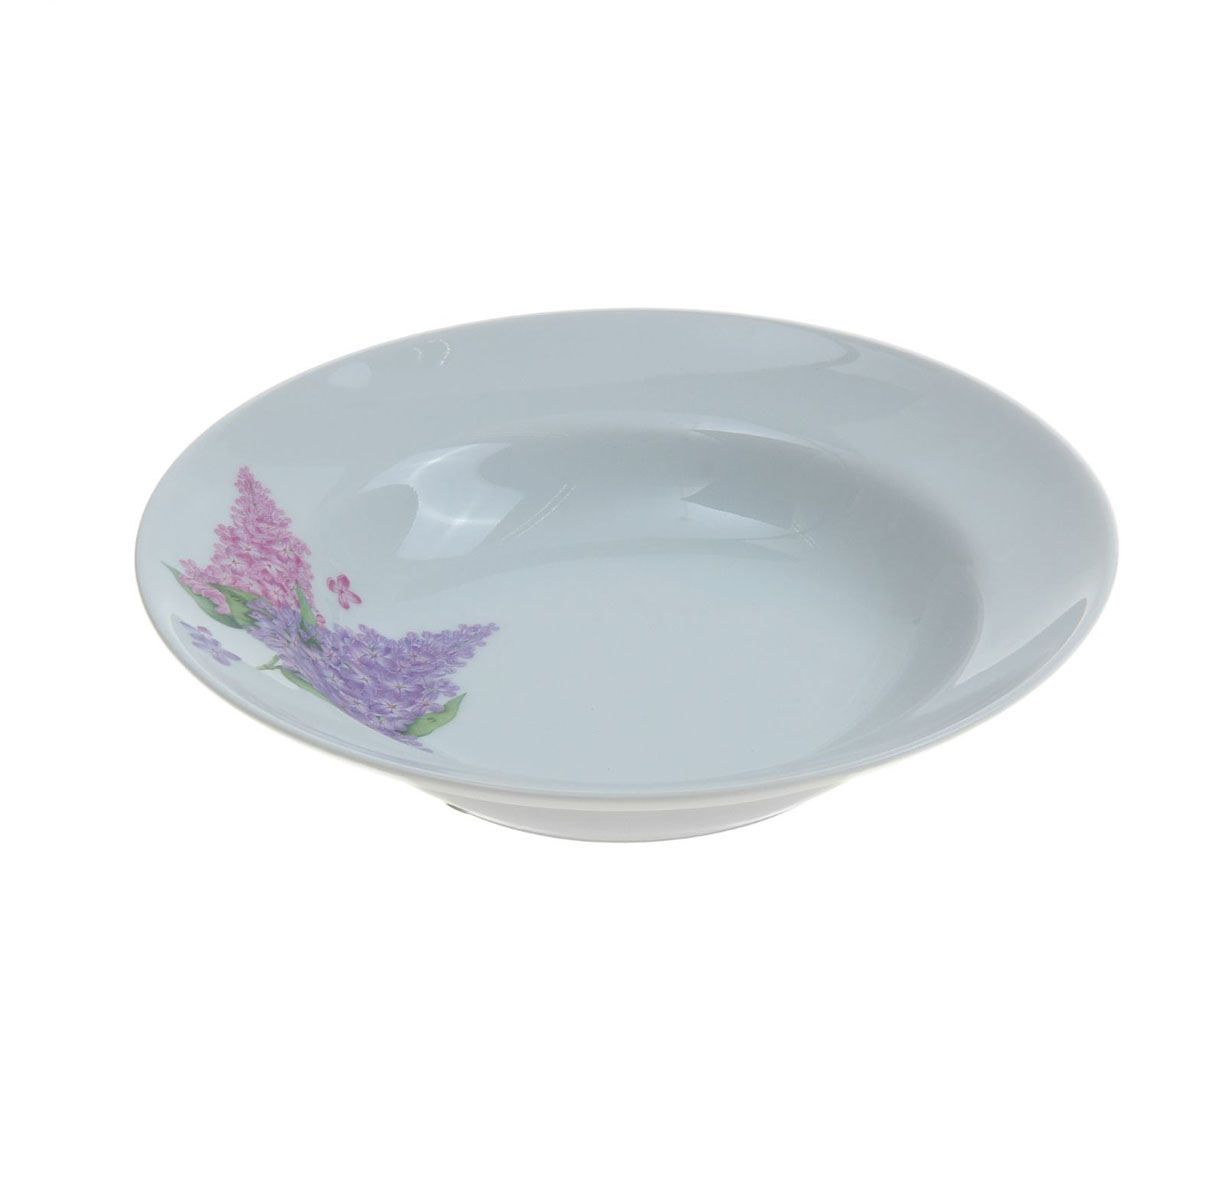 Тарелка глубокая Идиллия. Сирень, диаметр 20 см тарелка мелкая идиллия ромашка диаметр 20 см 5с0189